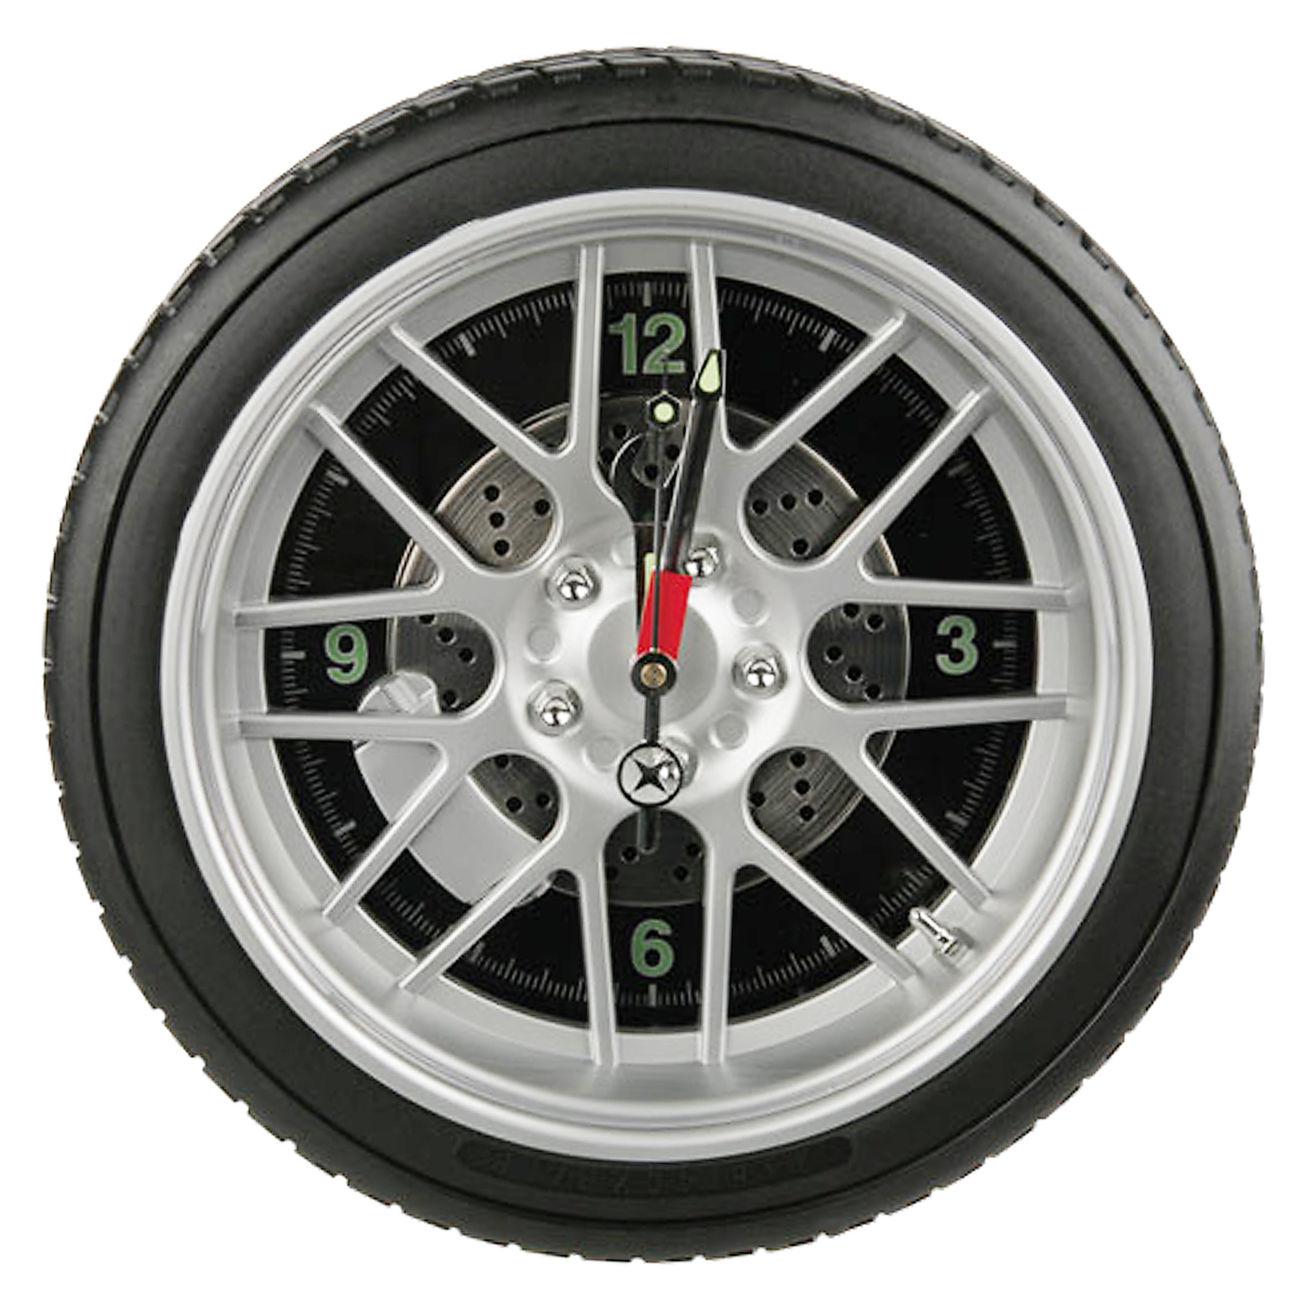 ootb led wanduhr reifen wheel clock 35 cm g nstig kaufen kotte zeller. Black Bedroom Furniture Sets. Home Design Ideas